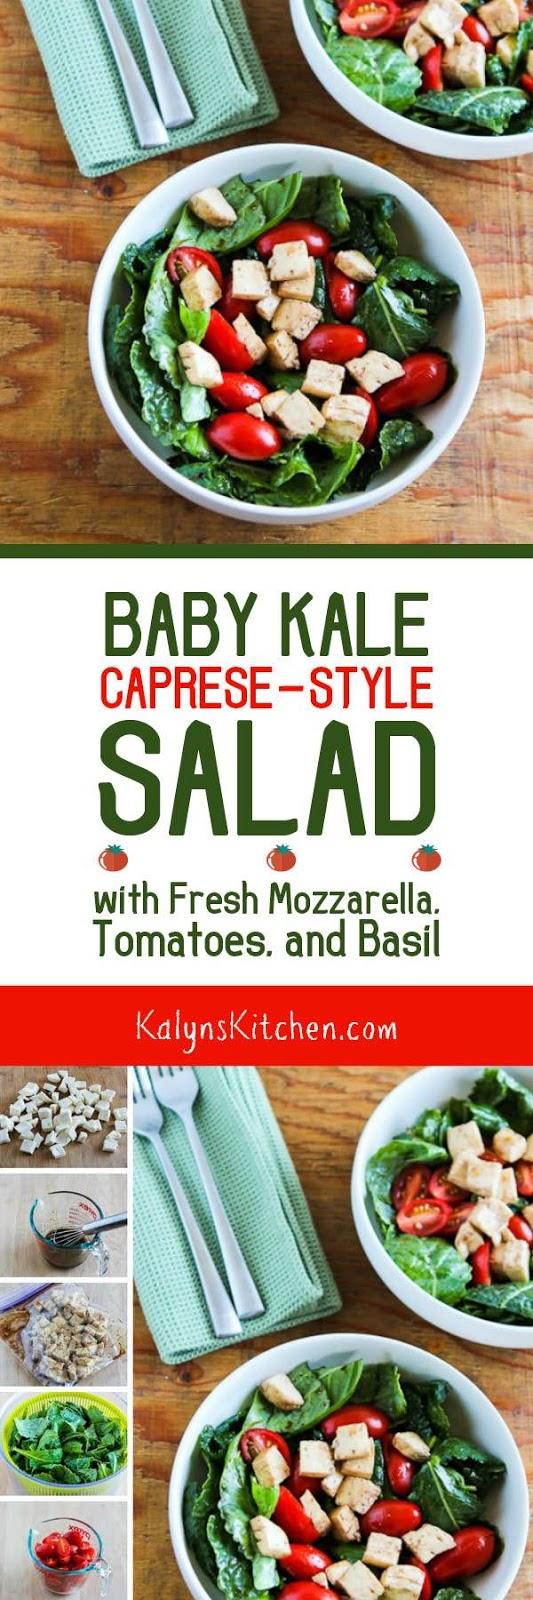 ... Kale Caprese-Style Salad with Fresh Mozzarella, Tomatoes, and Basil